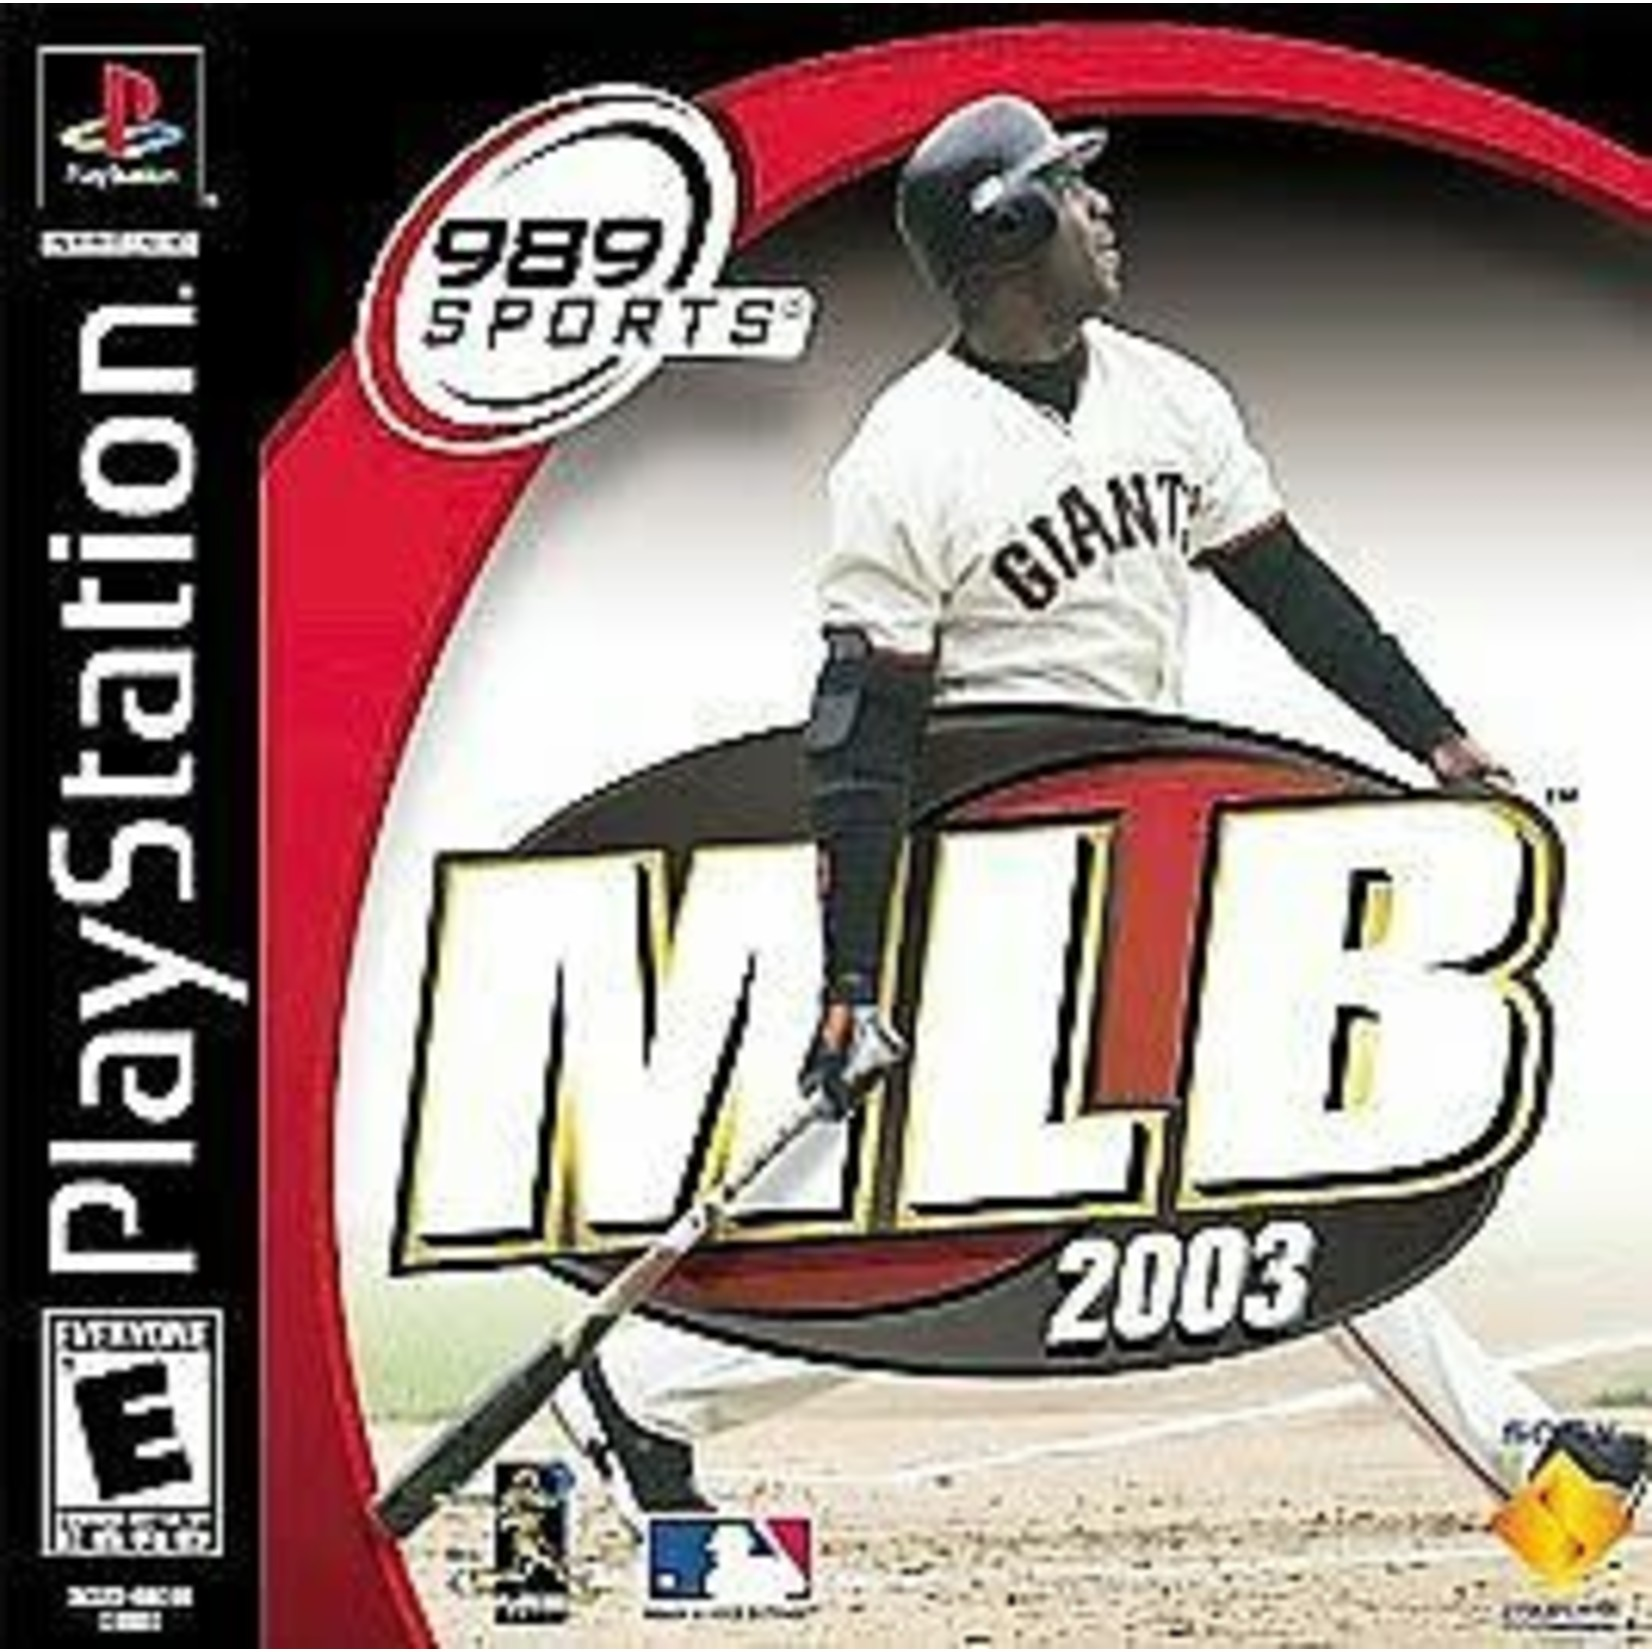 ps1u-MLB 2003